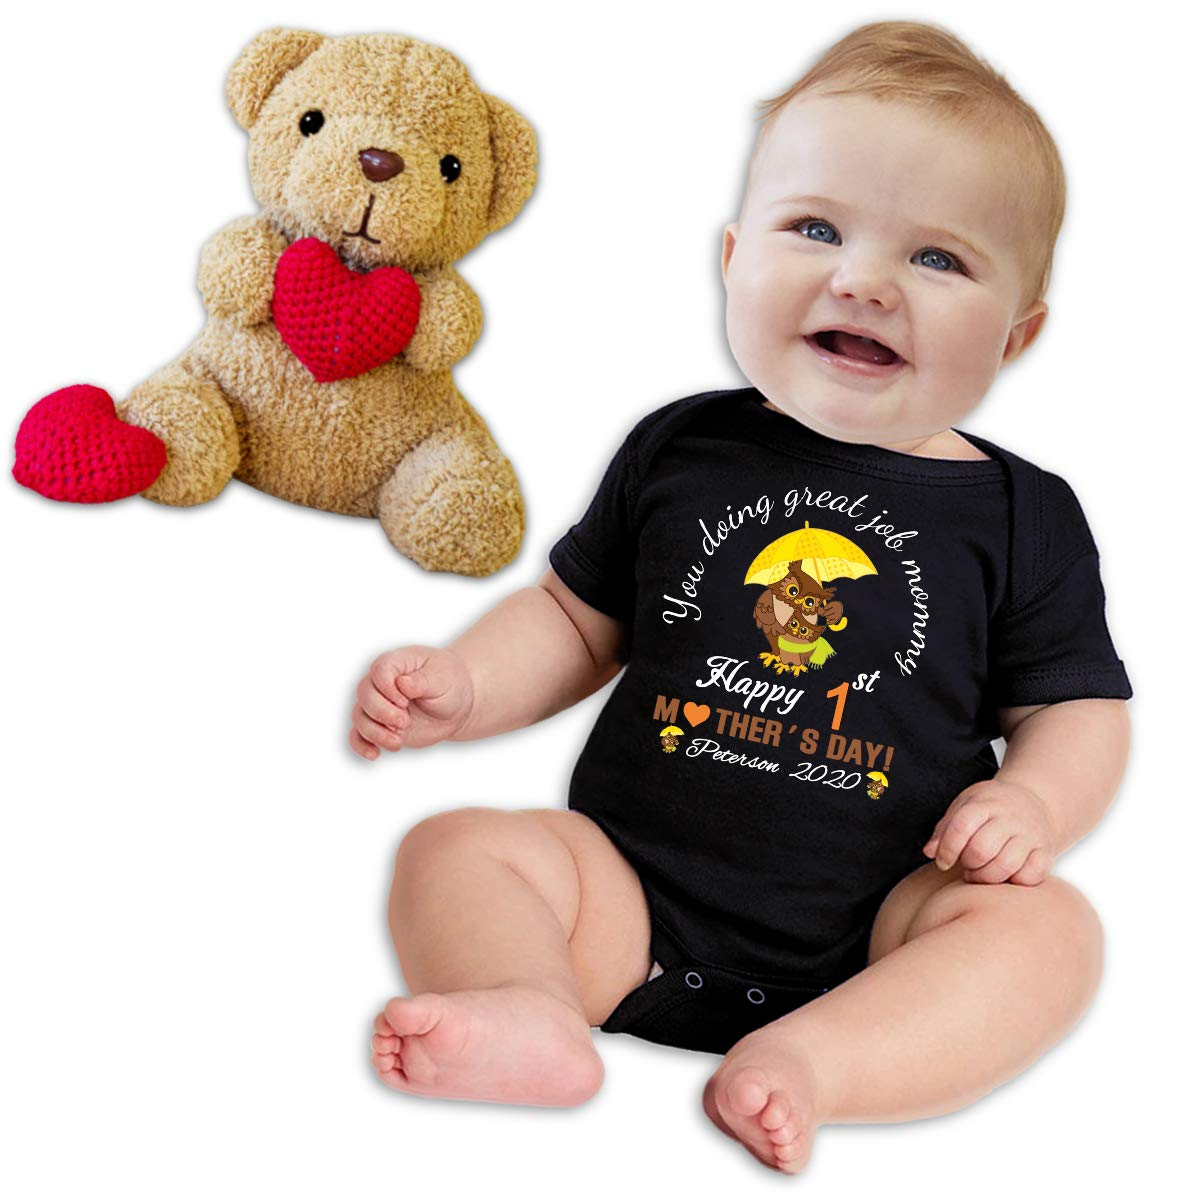 Personalized Custom Baby Onesies Boy Girl First Mothers Day Bodysuit White Black Short Sleeve